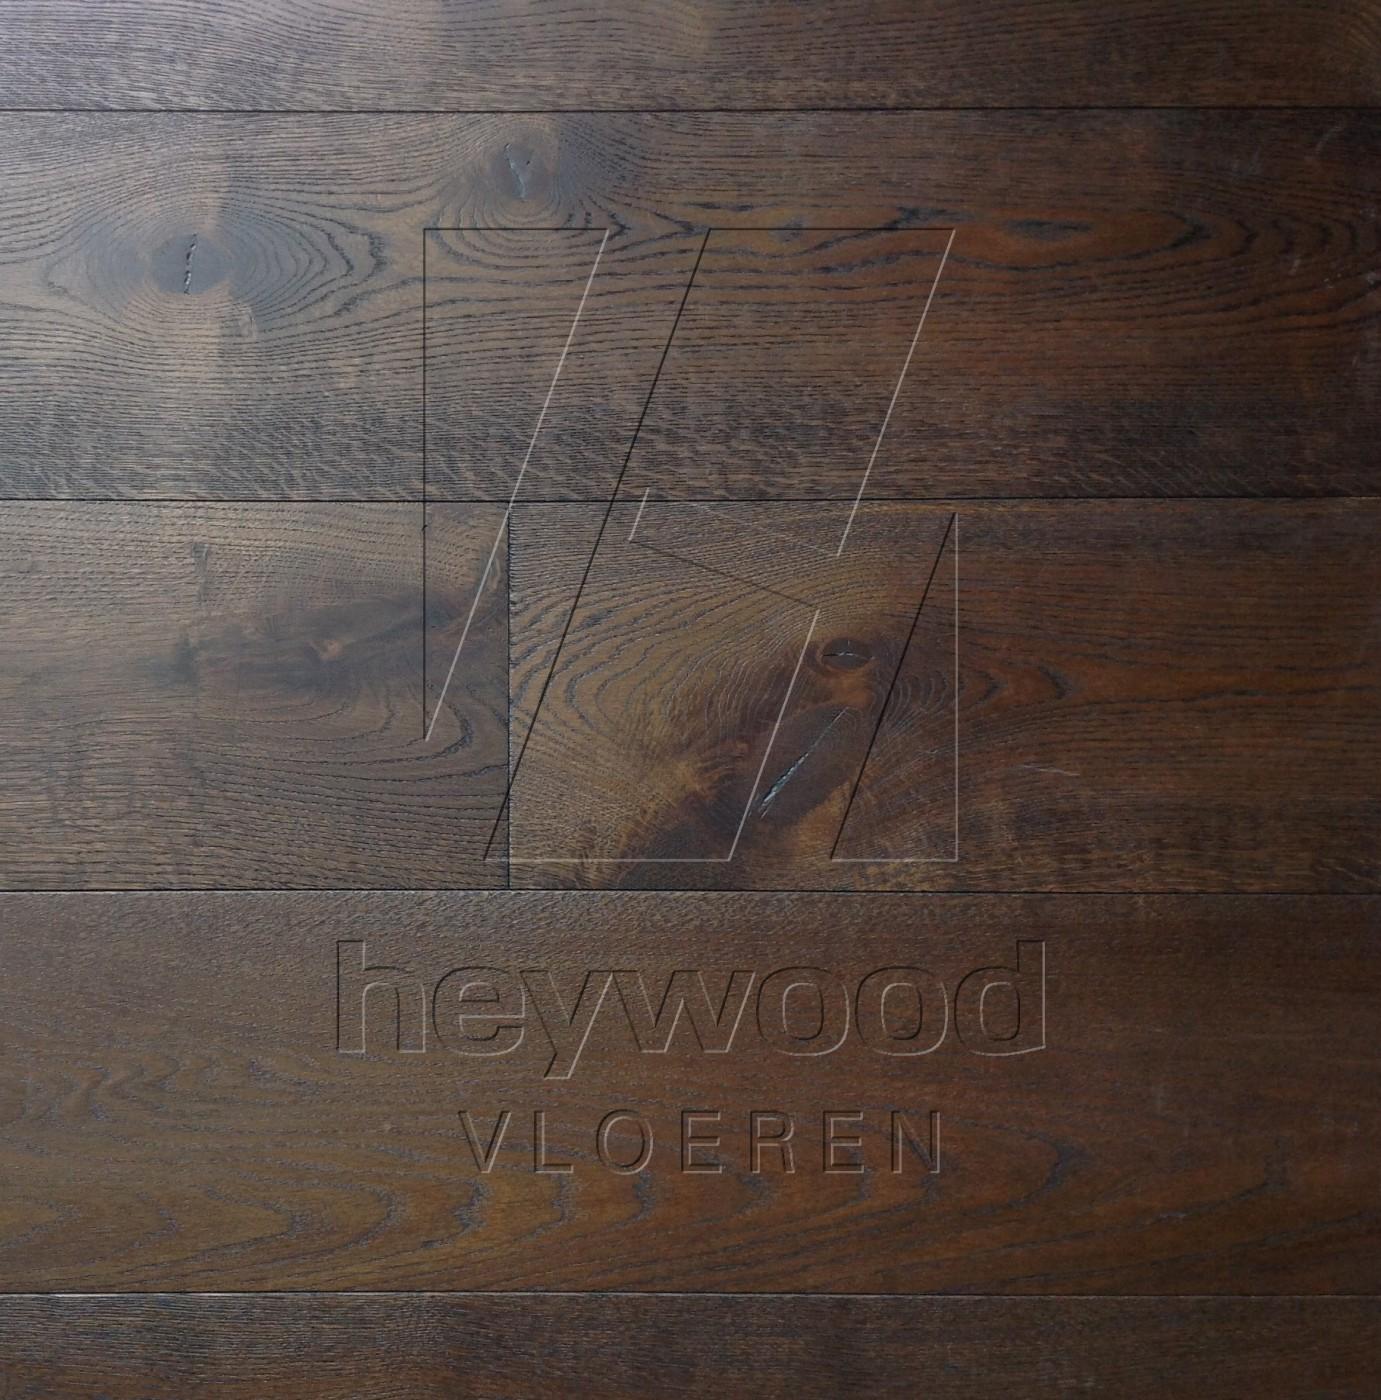 Edinburgh in European Oak Character of Bespoke Wooden Floors